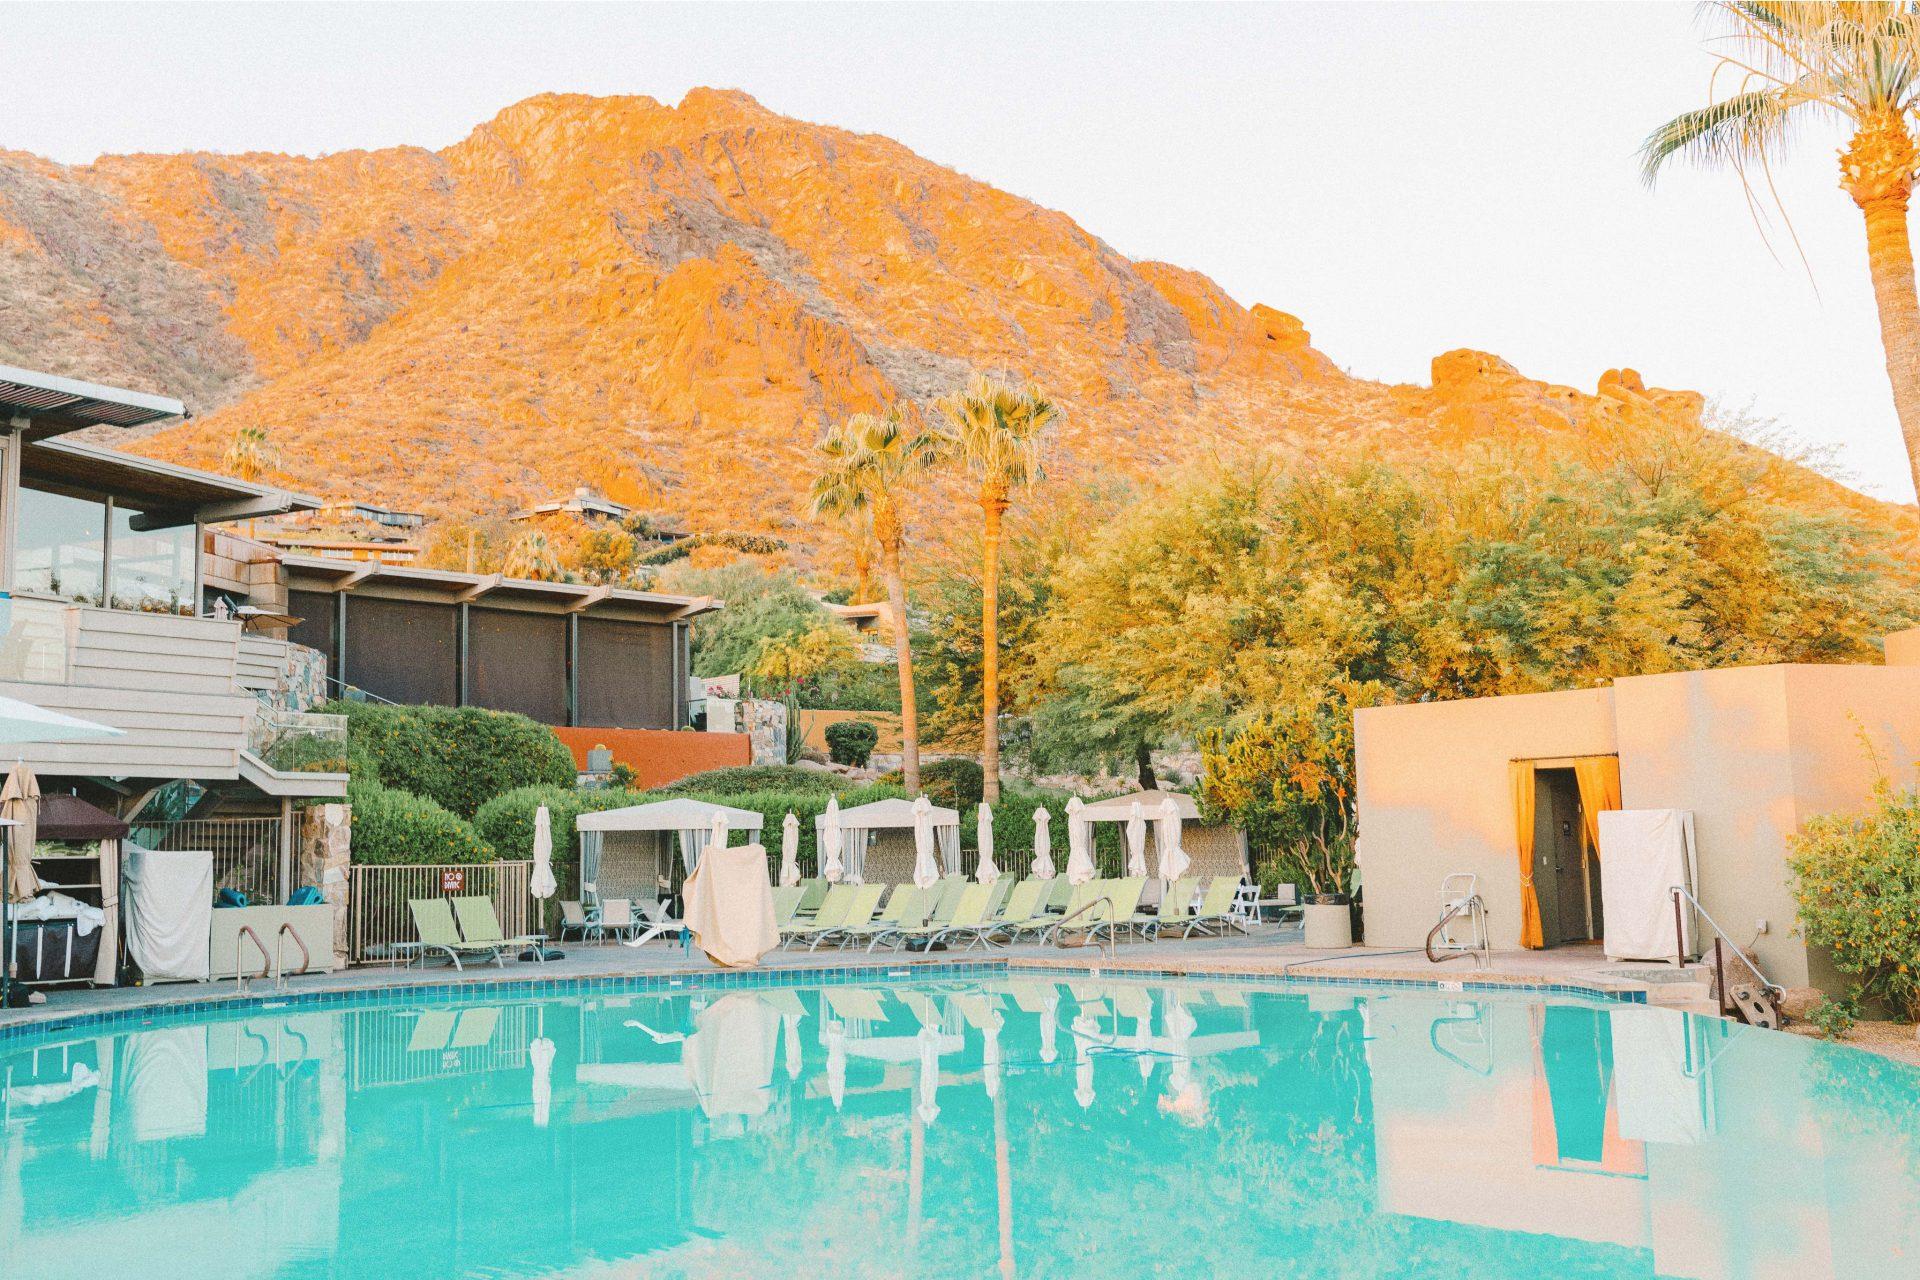 Sanctuary, resort, scottsdale Arizona, sanctuary resort scottsdale, travel guide, honeymoon, best place to stay, luxury, suite, pool